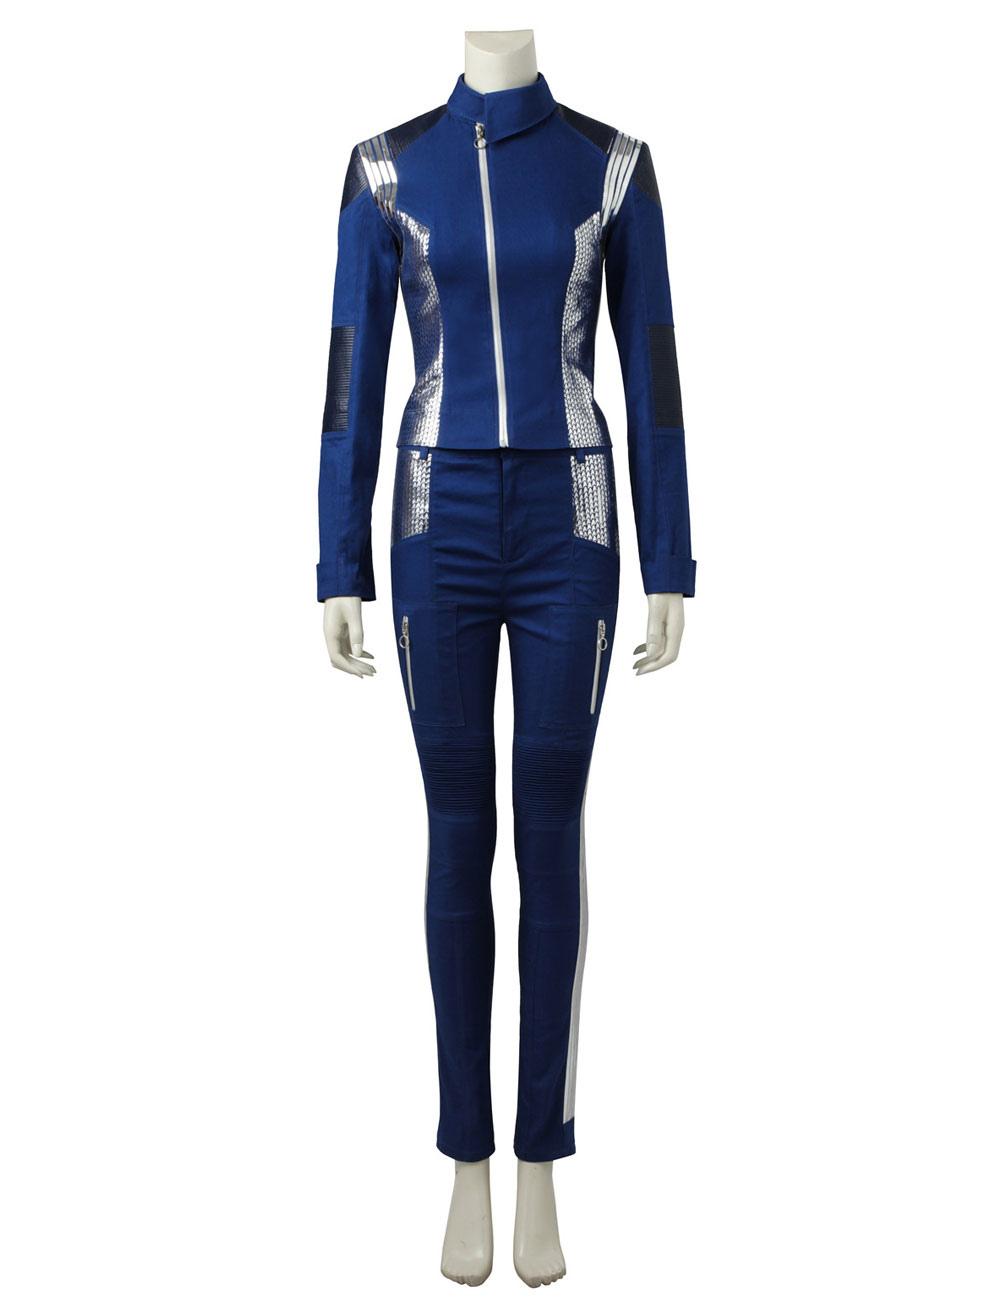 Buy Star Trek Discovery Michael Burnham Cosplay Halloween Cosplay Costume for $194.39 in Milanoo store